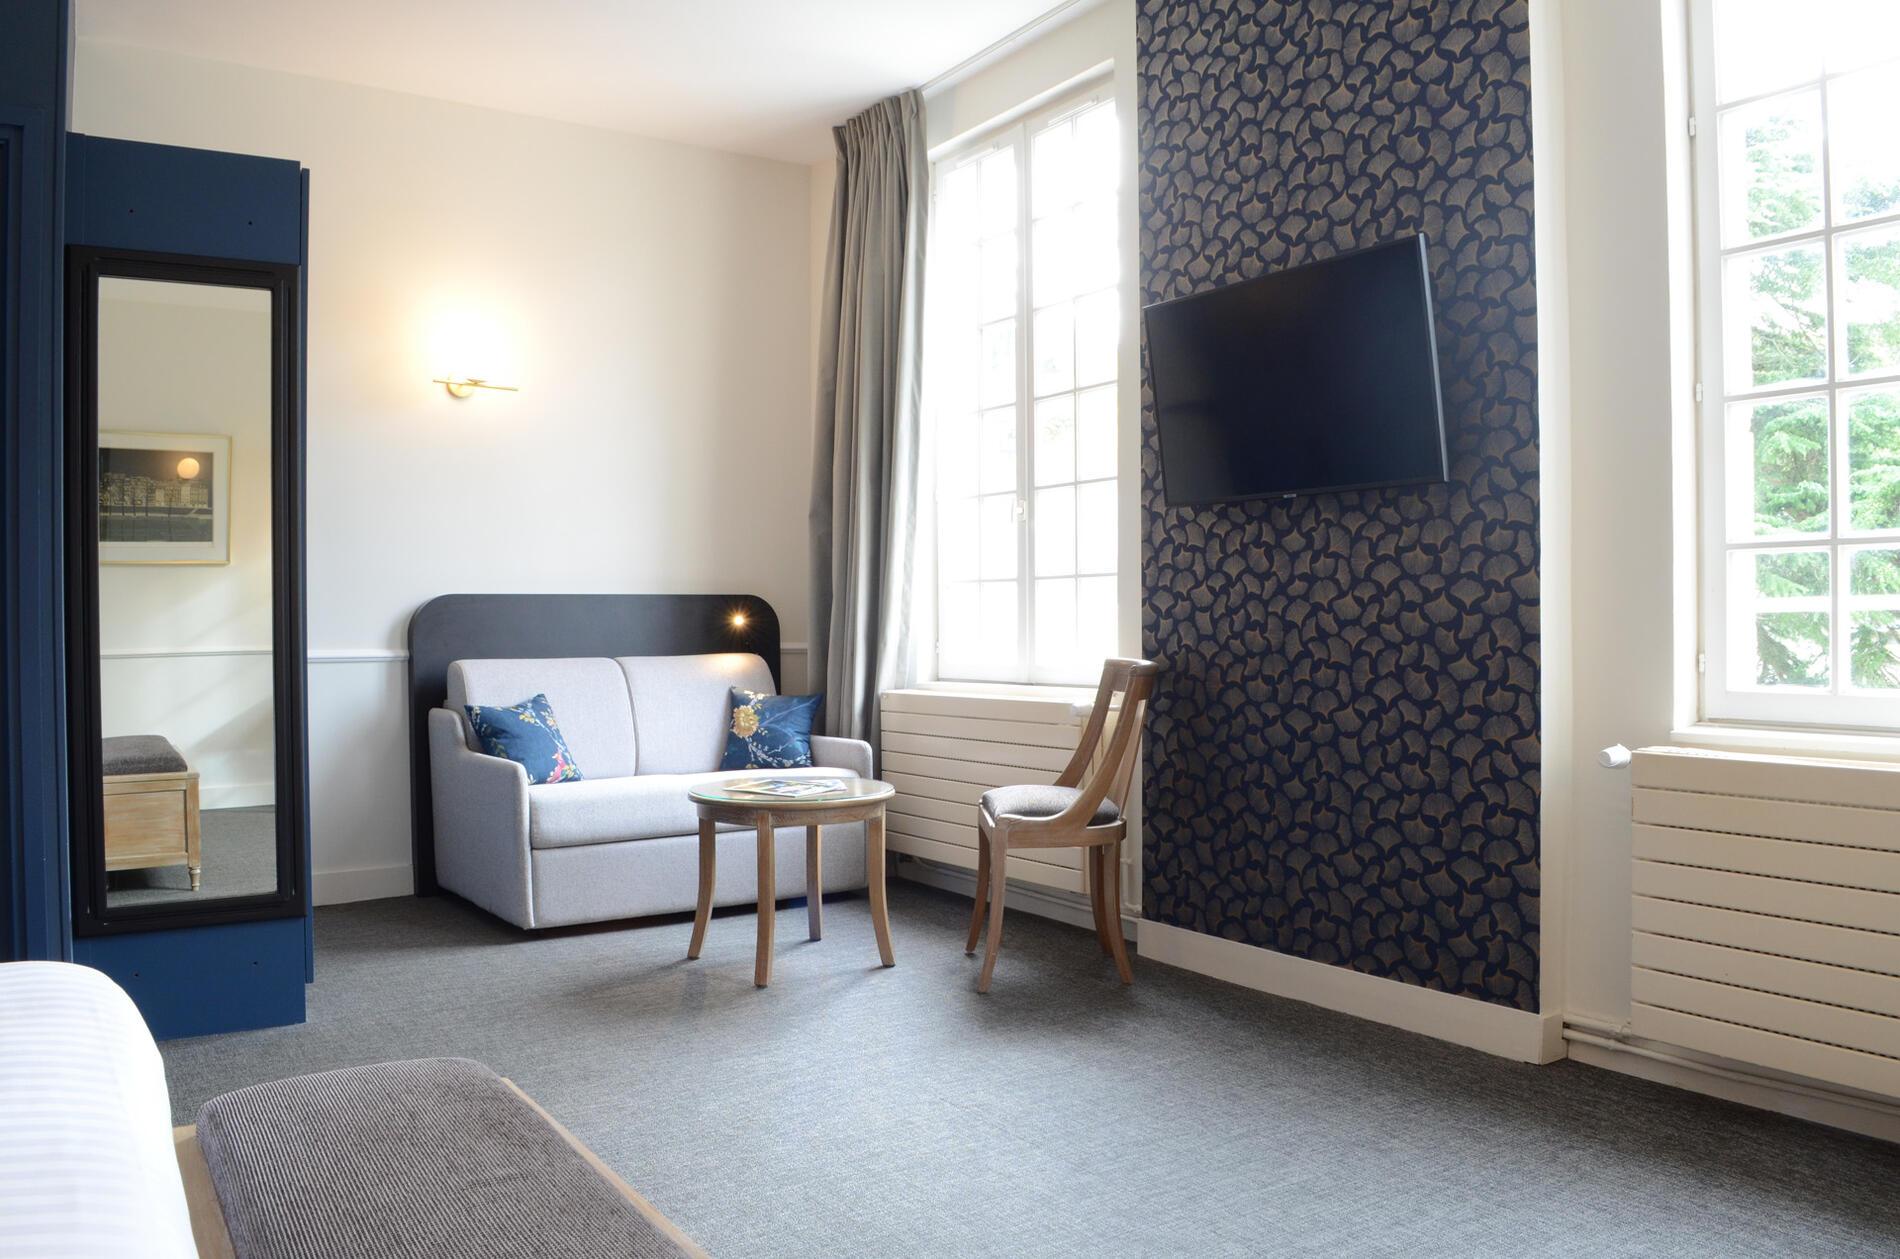 Prestige Chateau Room at Hotel Anne d'Anjou in Saumur, France